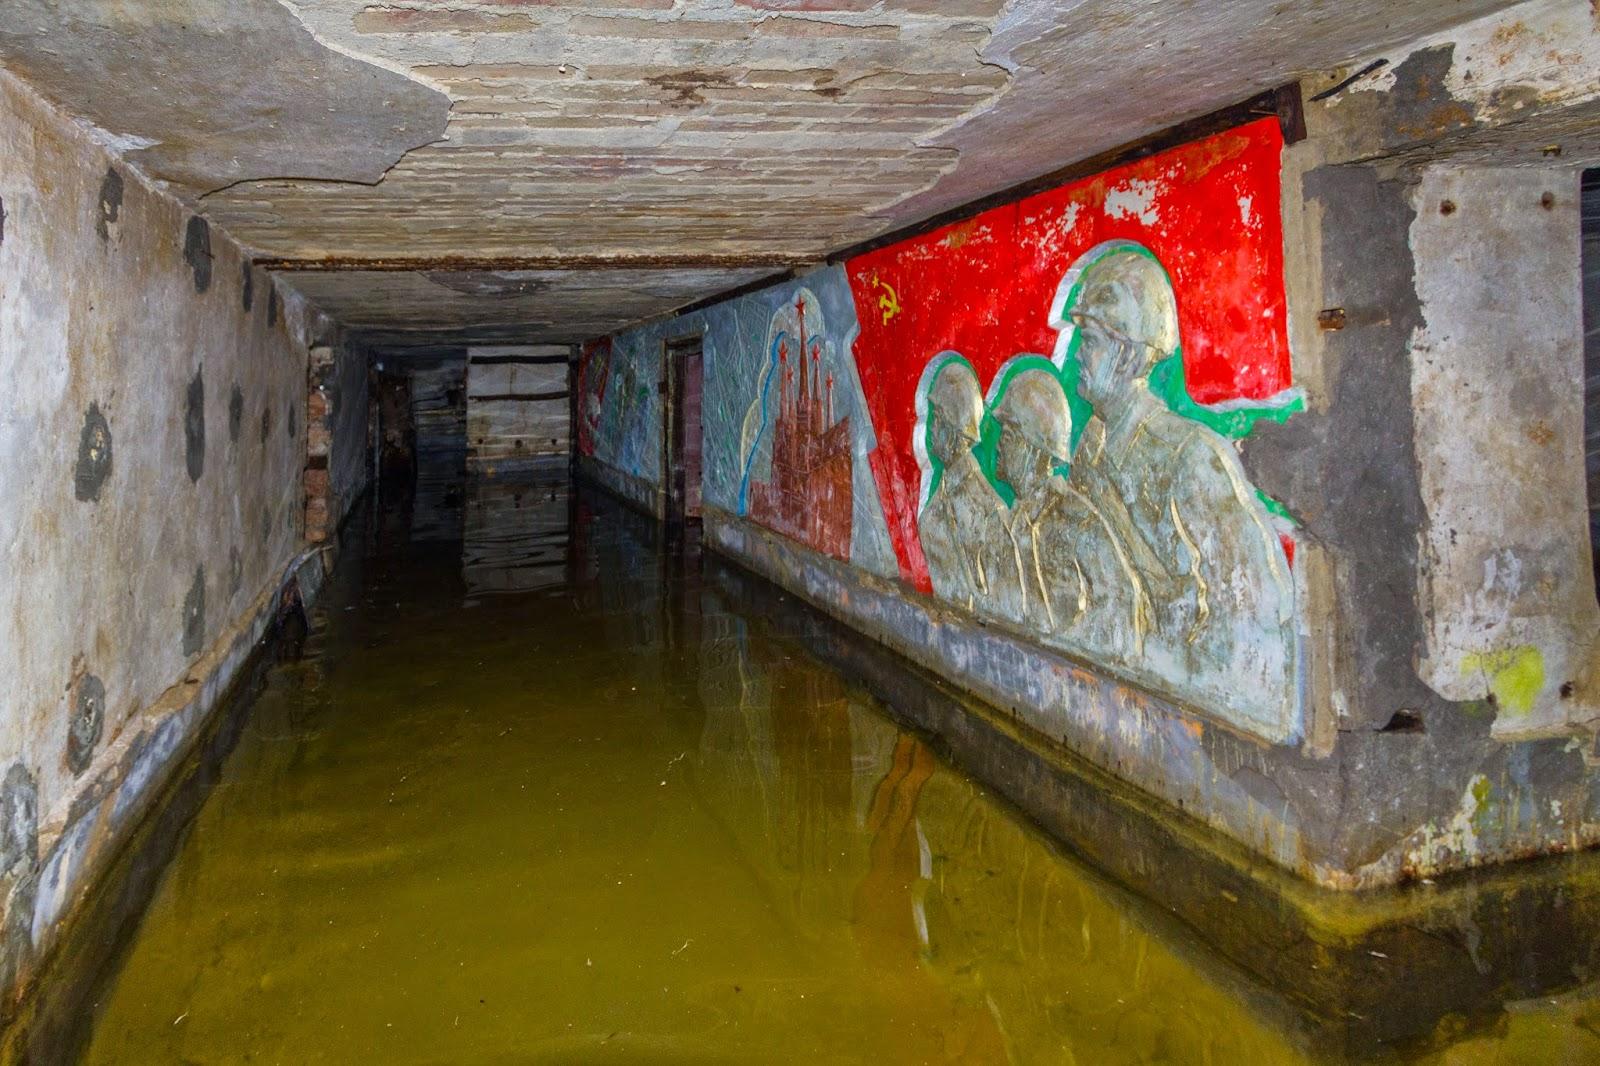 Vogelsang Soviet Military Nuclear Base Abandoned Berlin-9365.jpg